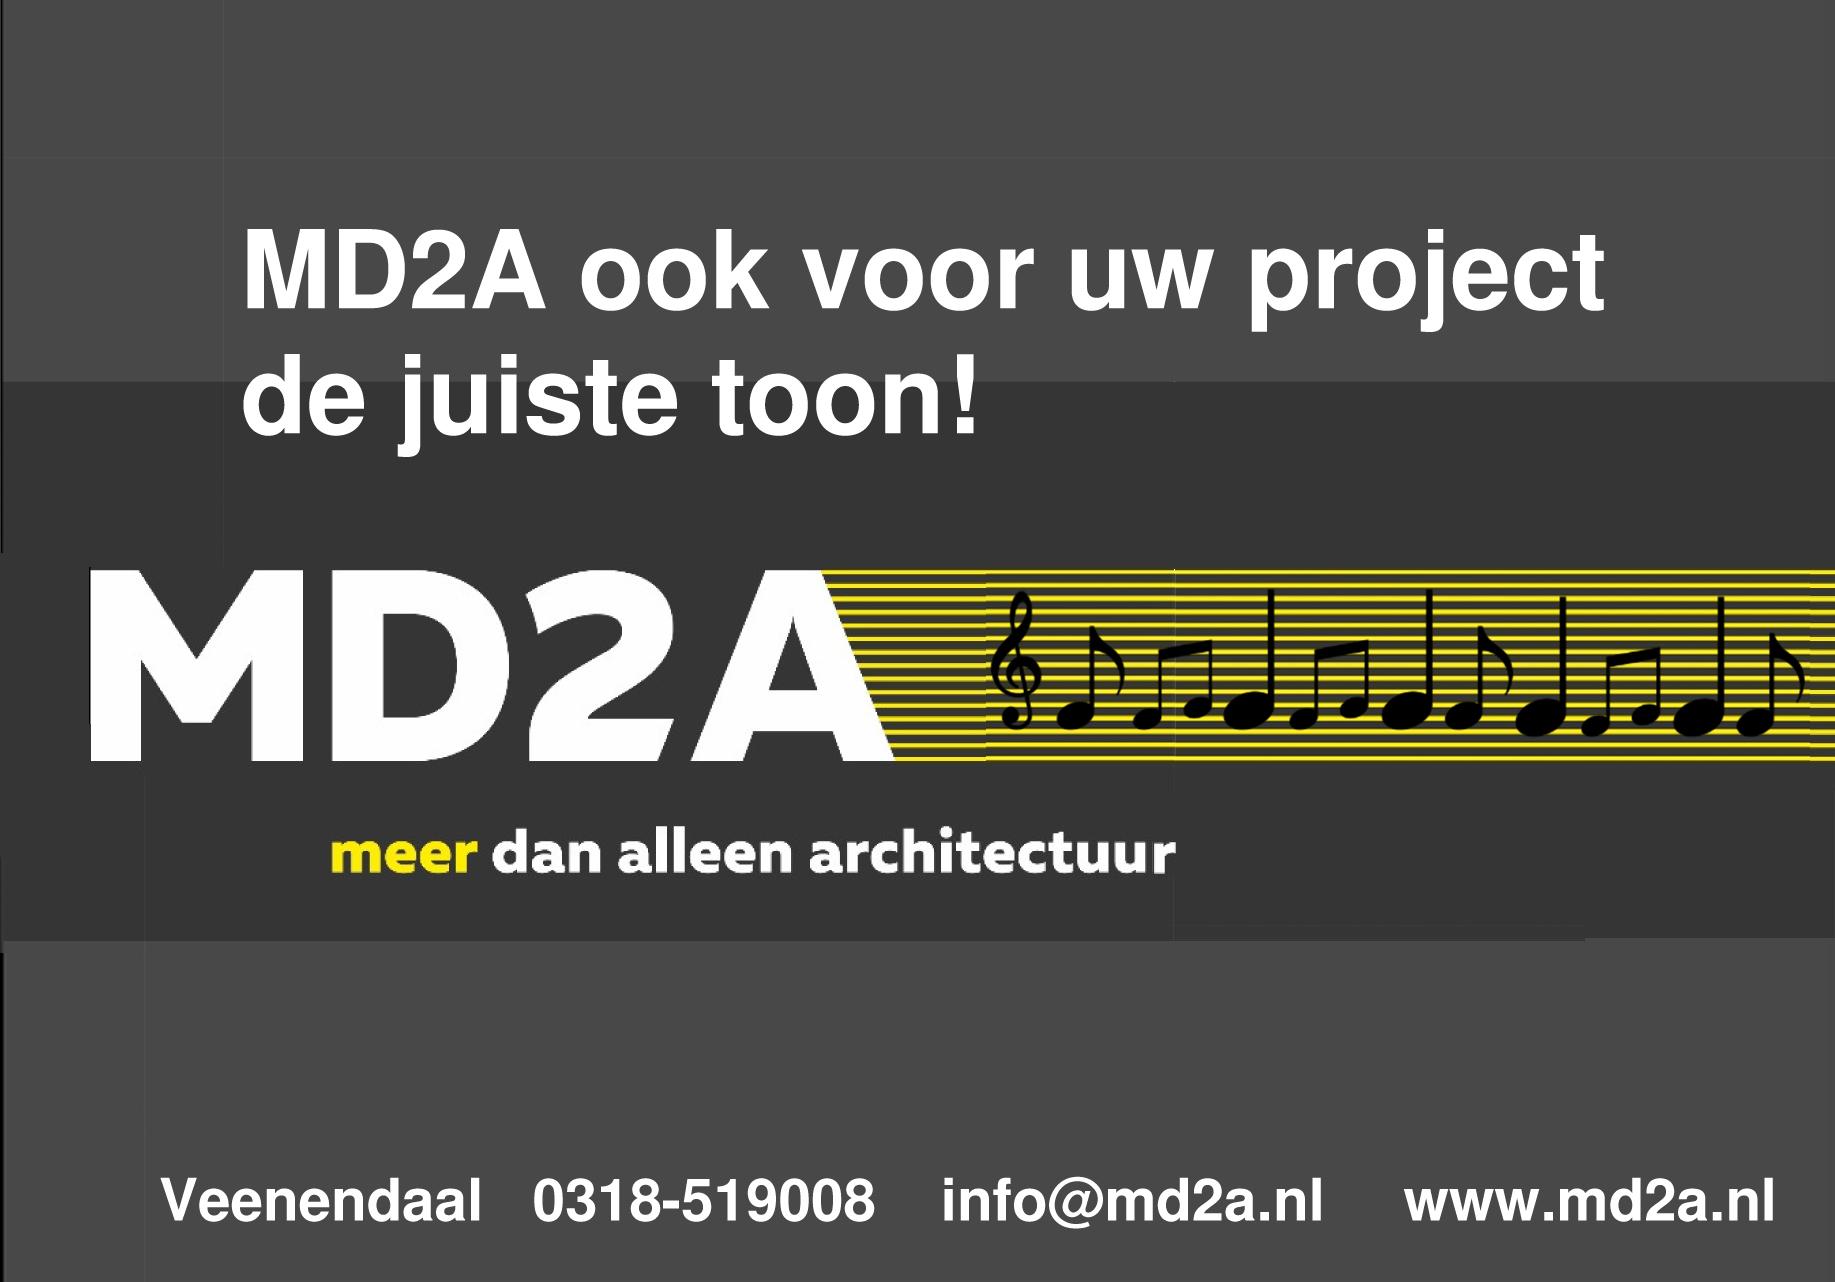 MD2A Architecten Veenendaal